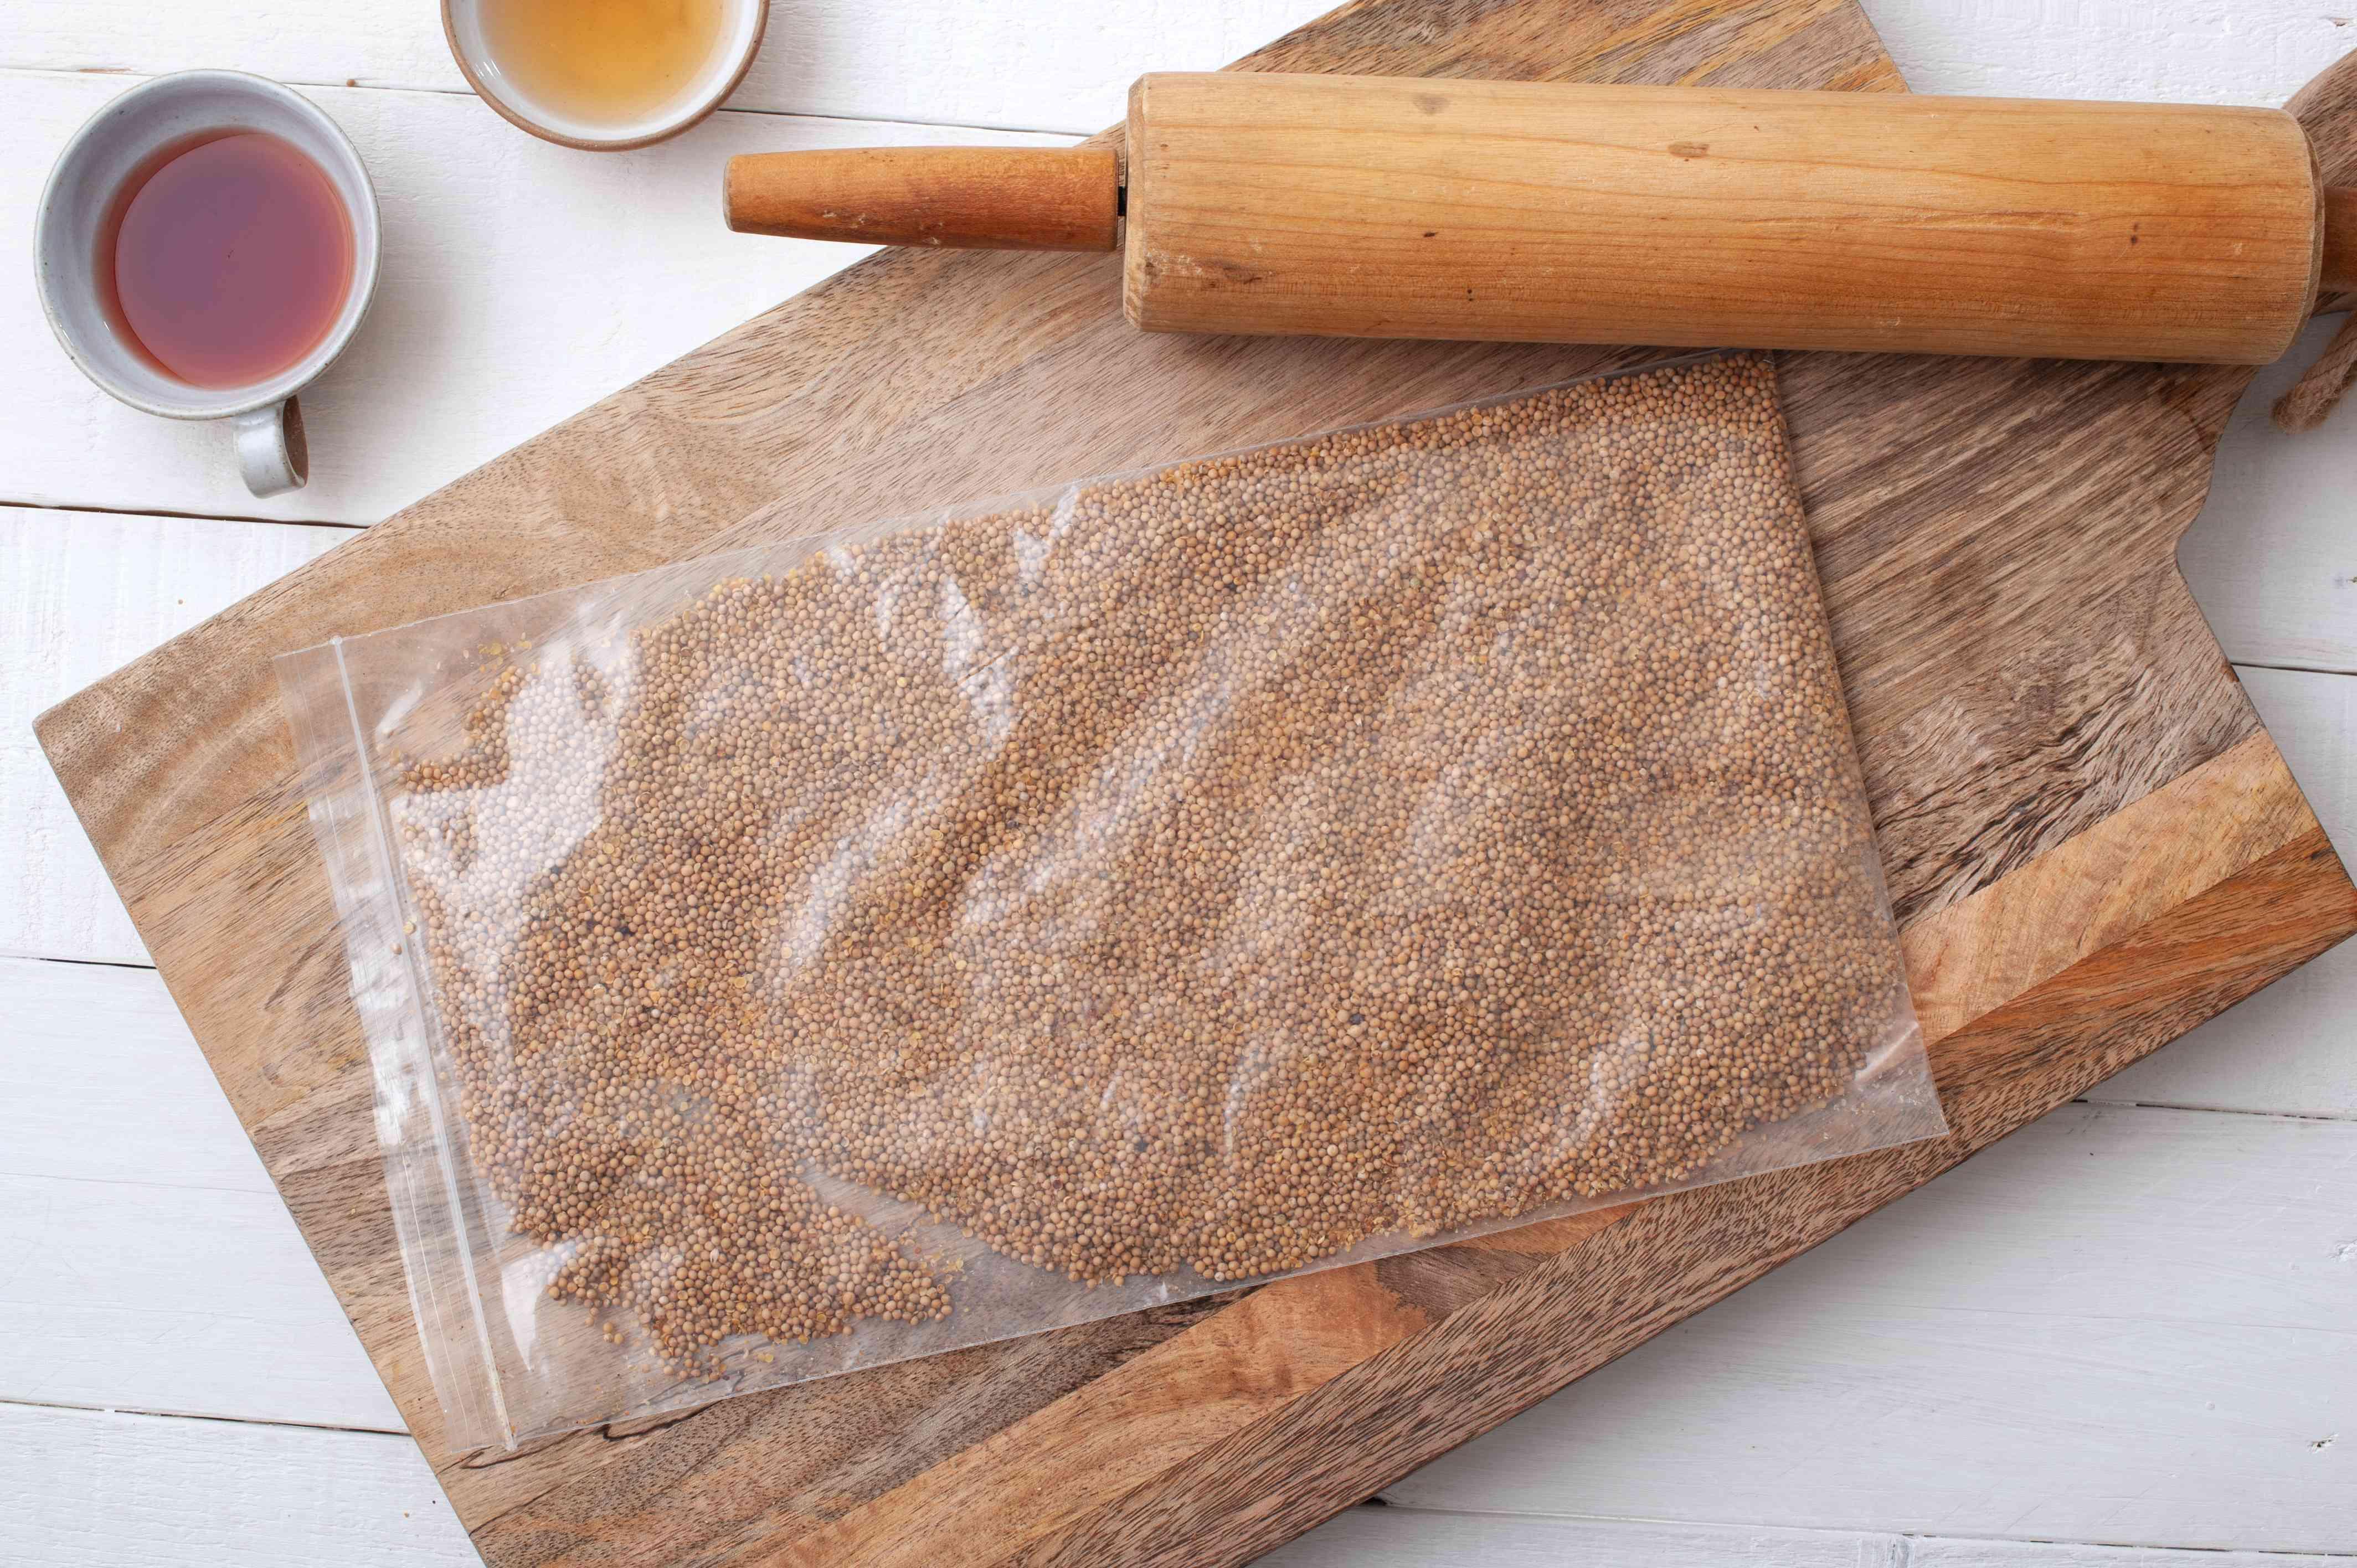 Place mustard seeds in ziptop bag